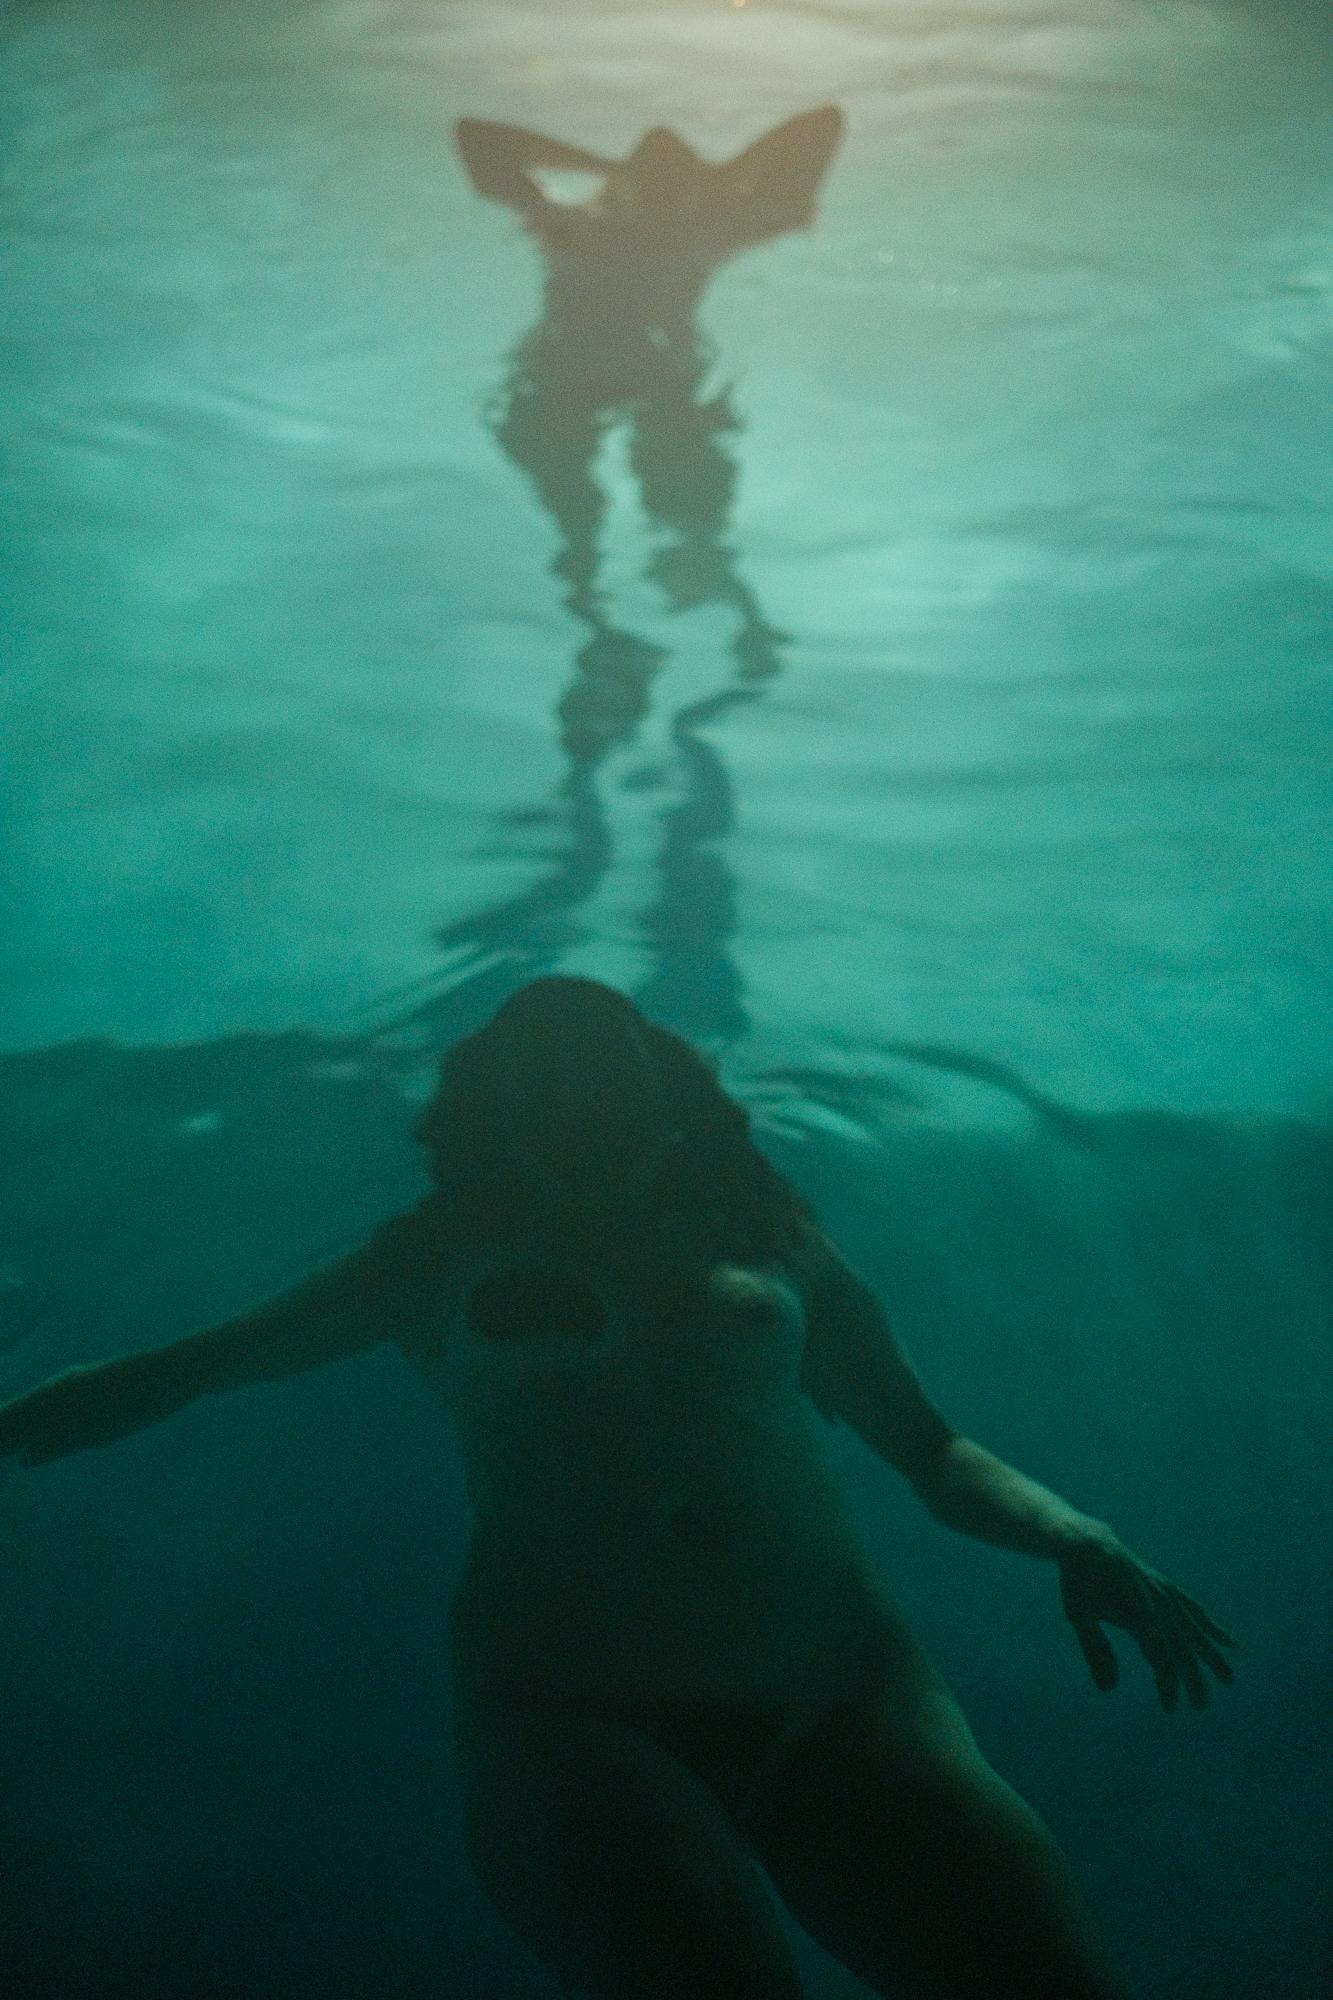 20170619-Ariane-Cassidy-Hannah-swimming-pool-X-Pro2-0331-Edit.jpg